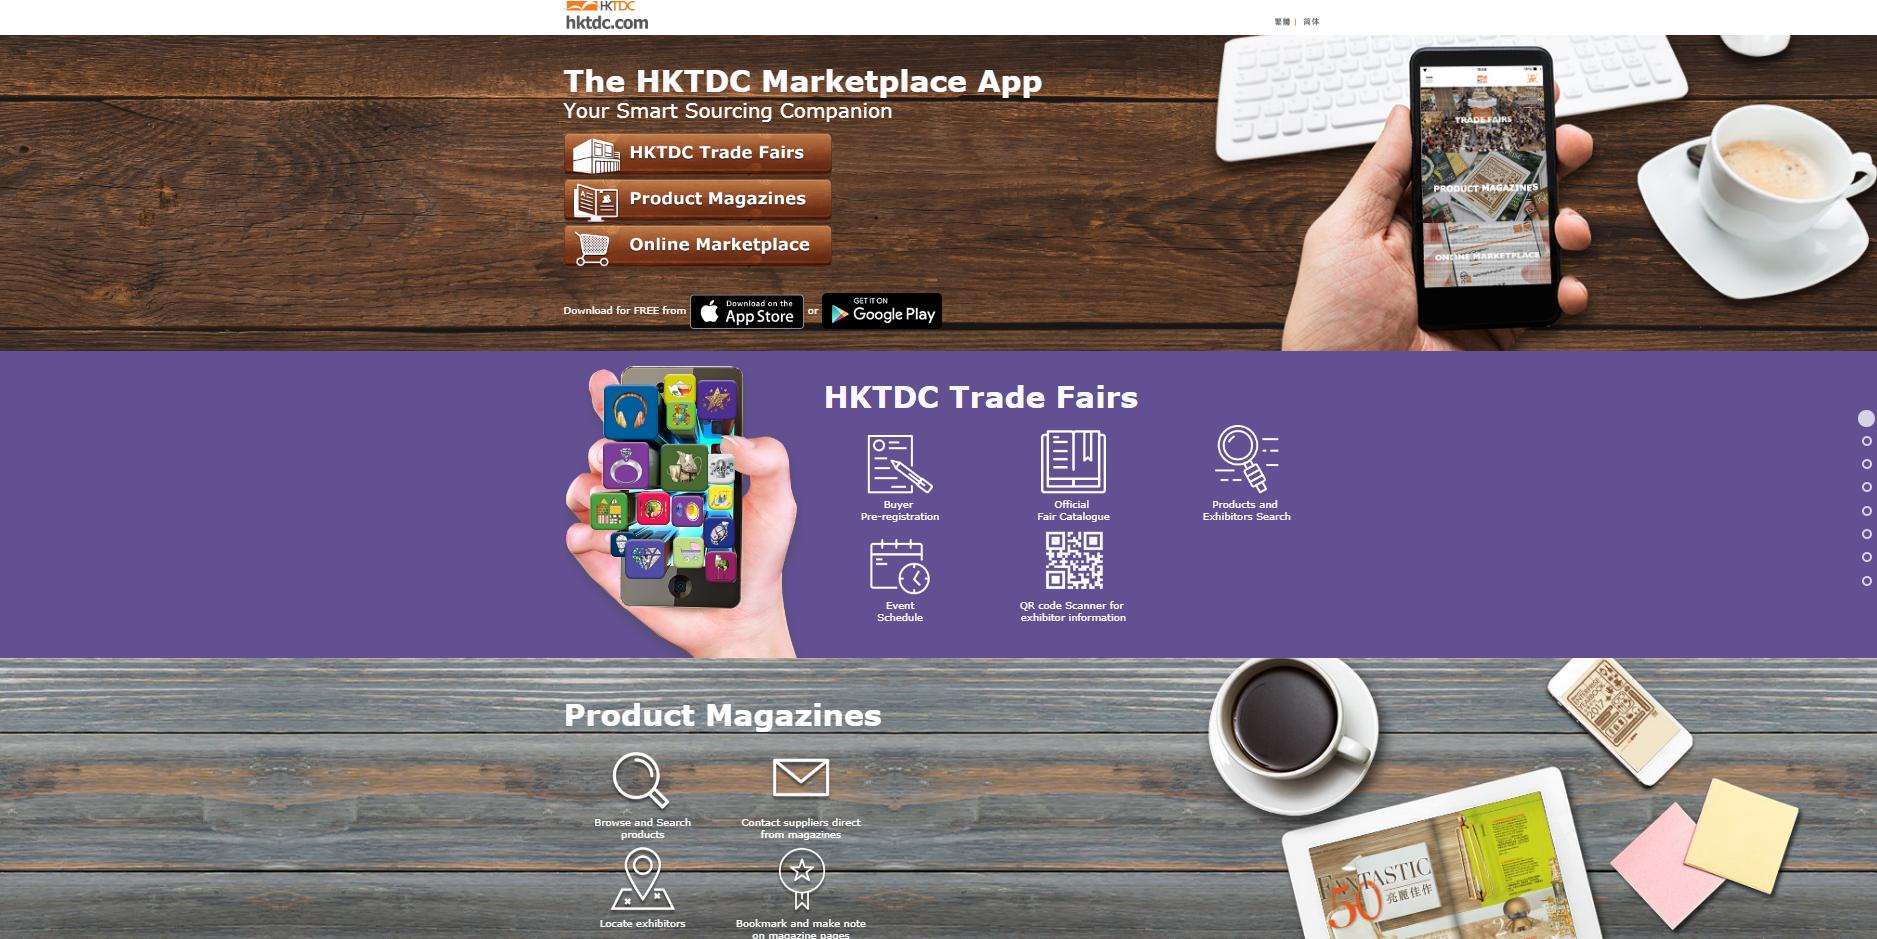 image of Hong Kong Trade Development Council (HKTDC)  Wins 2017 Best B2B Mobile Application, Best E-Zine Mobile Application, Best International Business Mobile Application Mobile WebAward for HKTDC Marketplace App